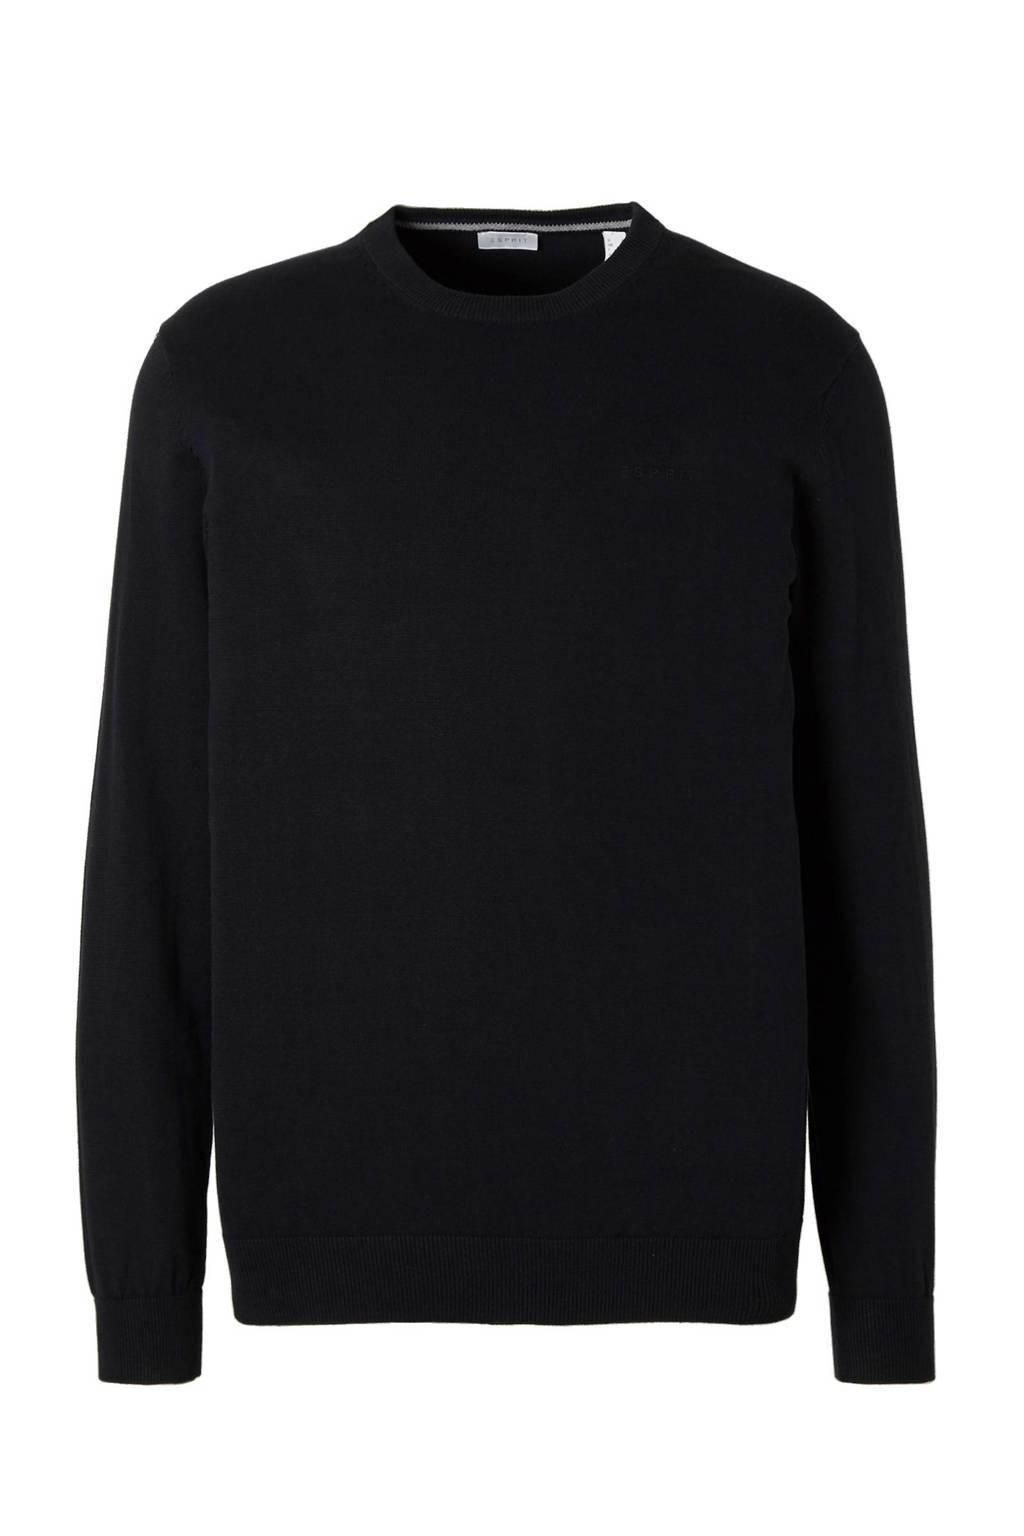 ESPRIT Men Casual trui, Zwart